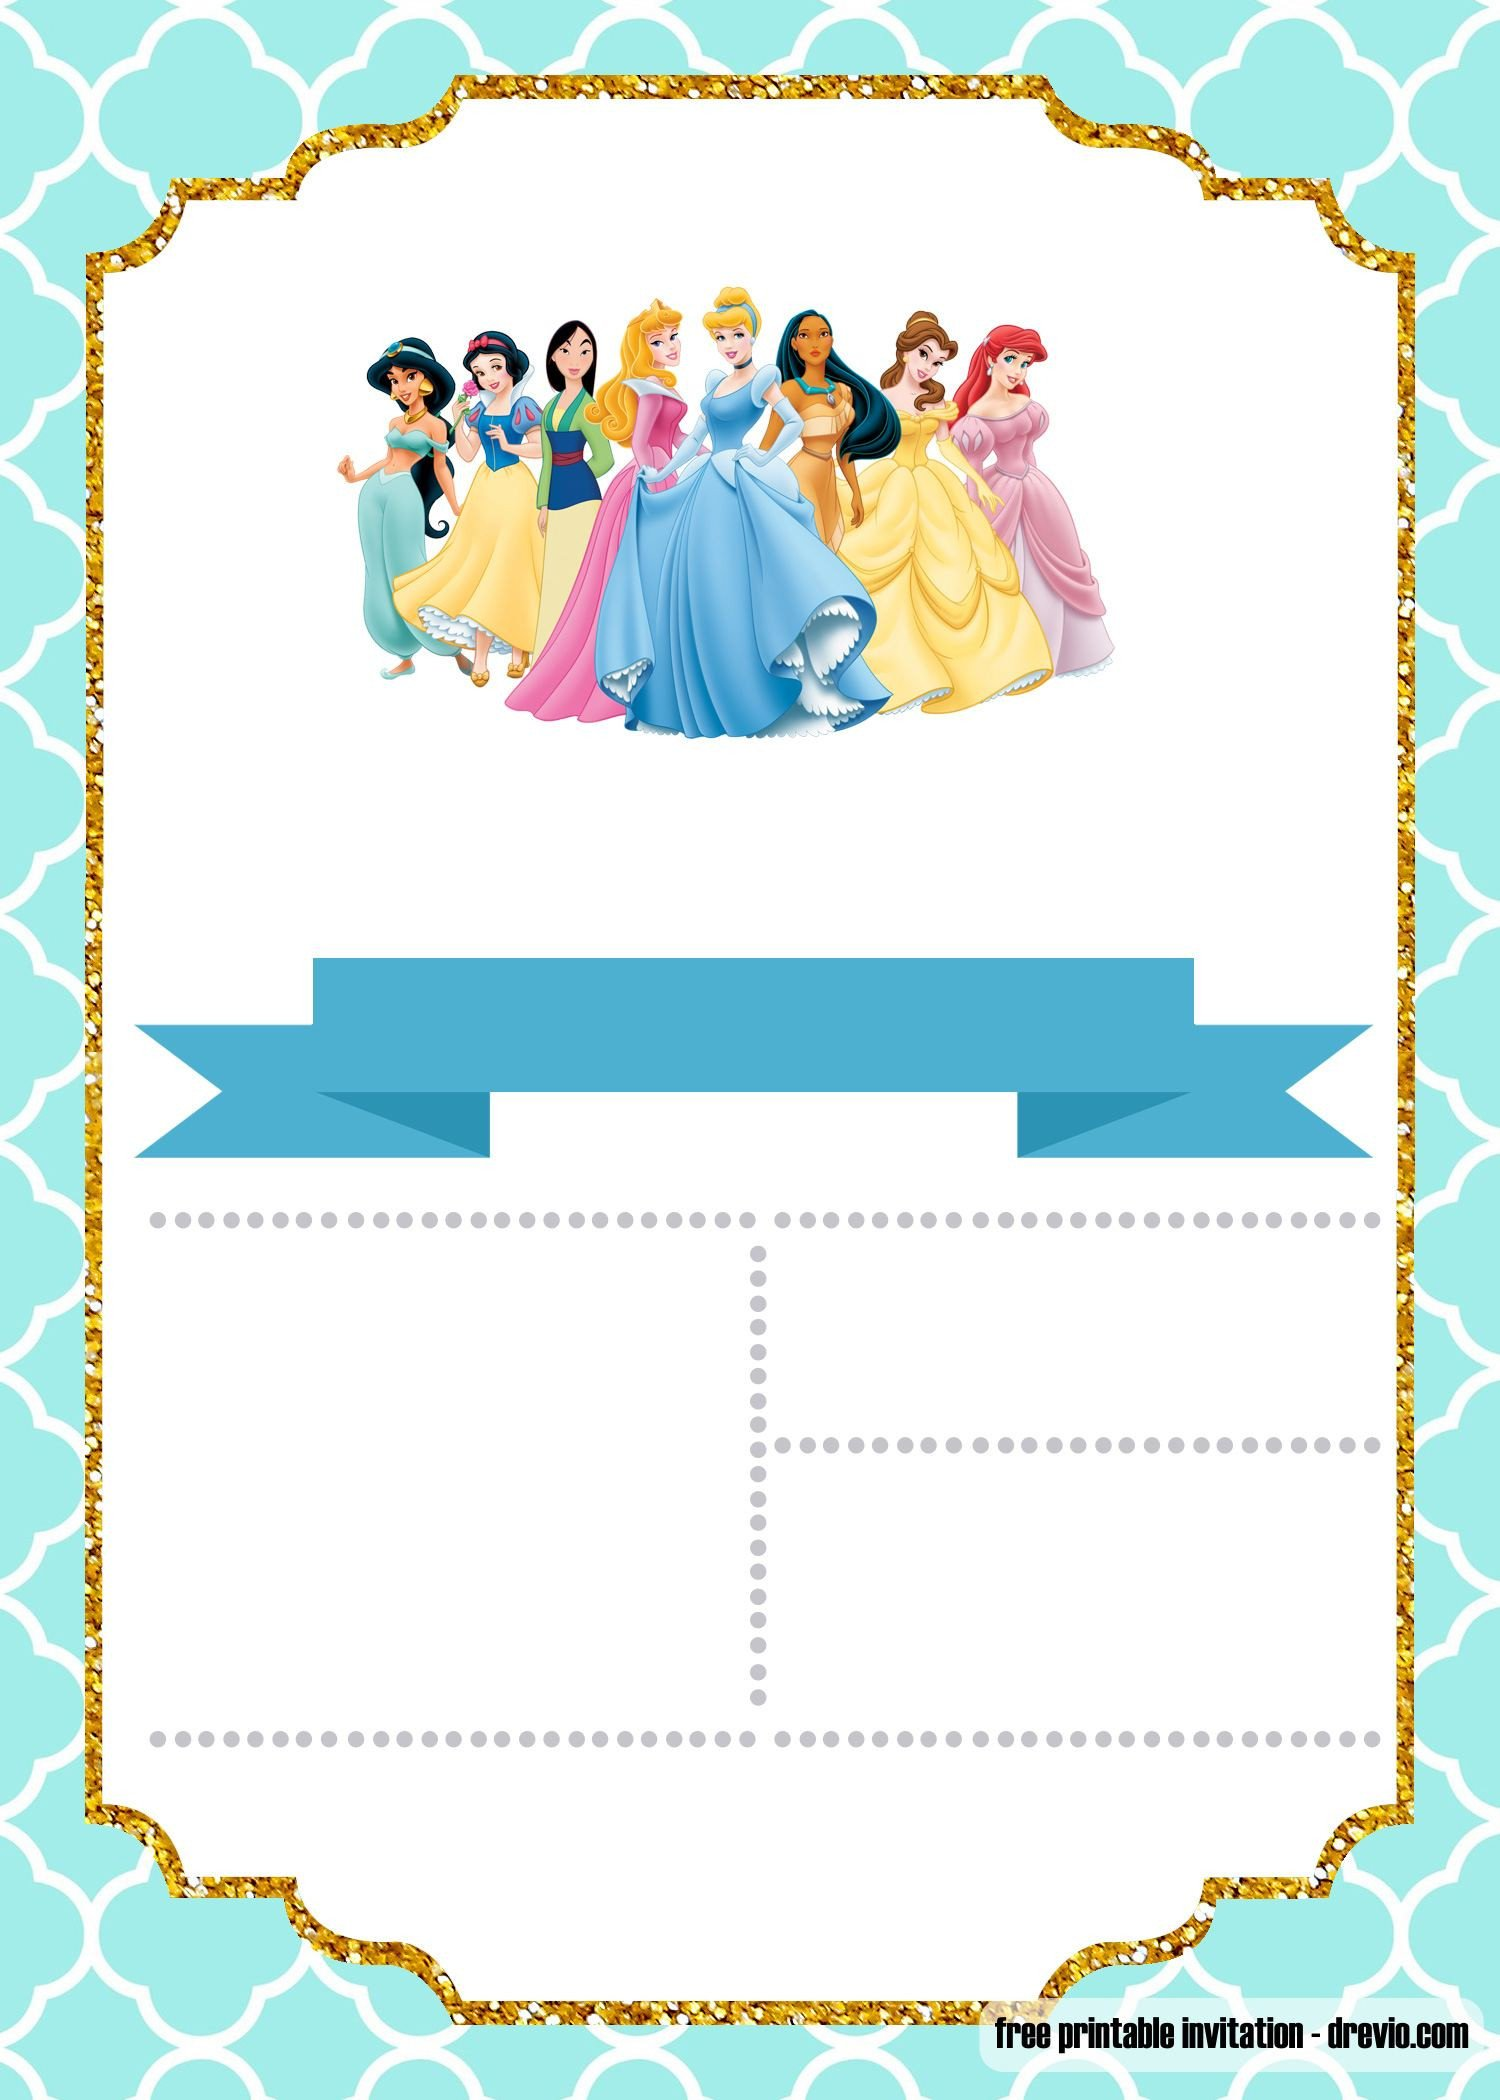 Disney Princess Invitation Template Free Disney Princess Invitation Template for Your Little